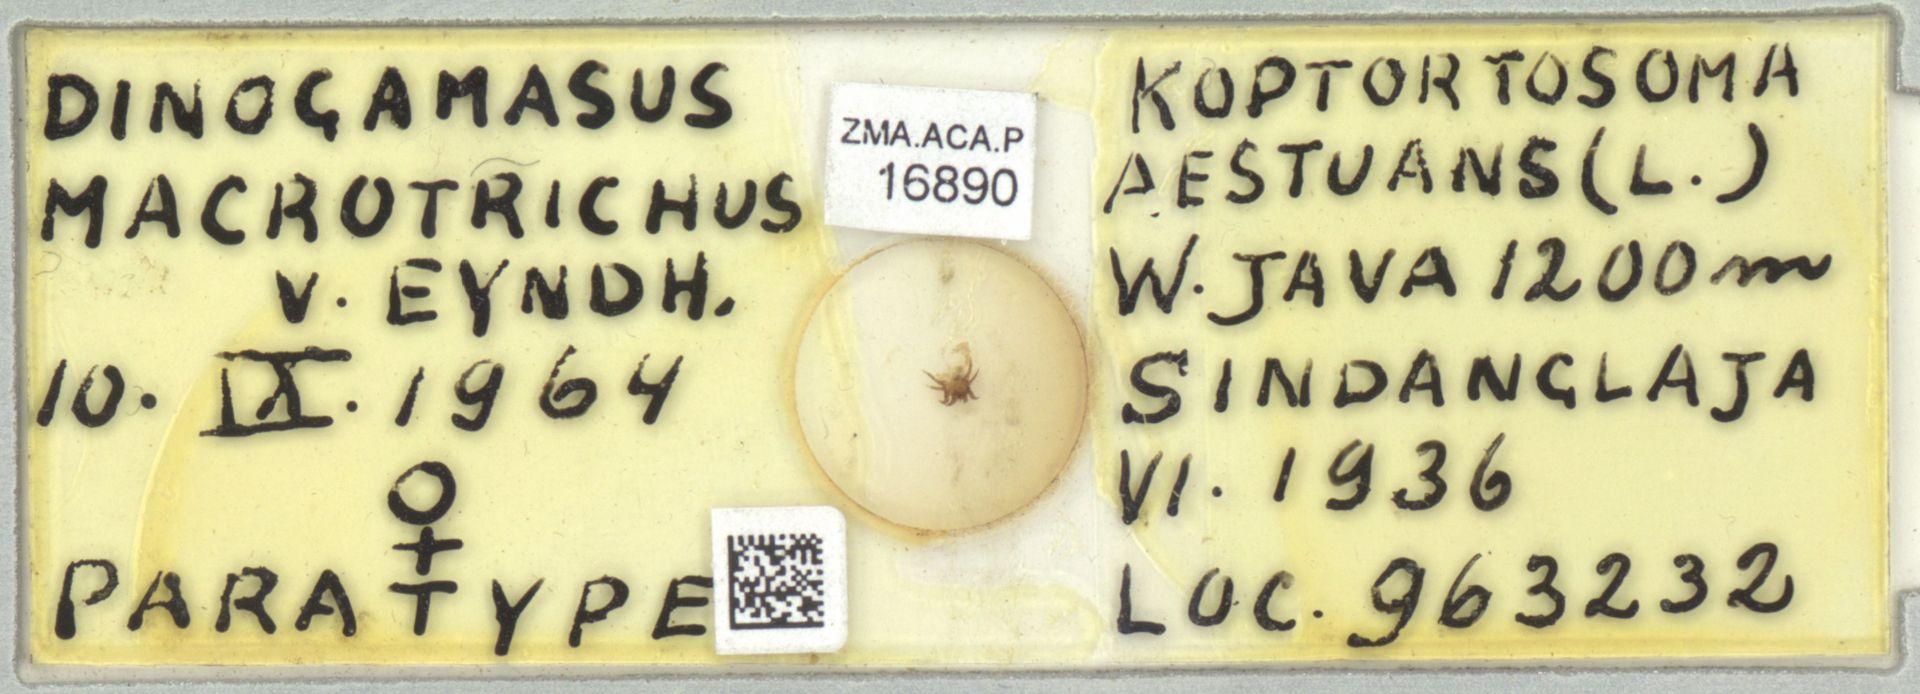 ZMA.ACA.P.16890 | Dinogamasus macrotrichus